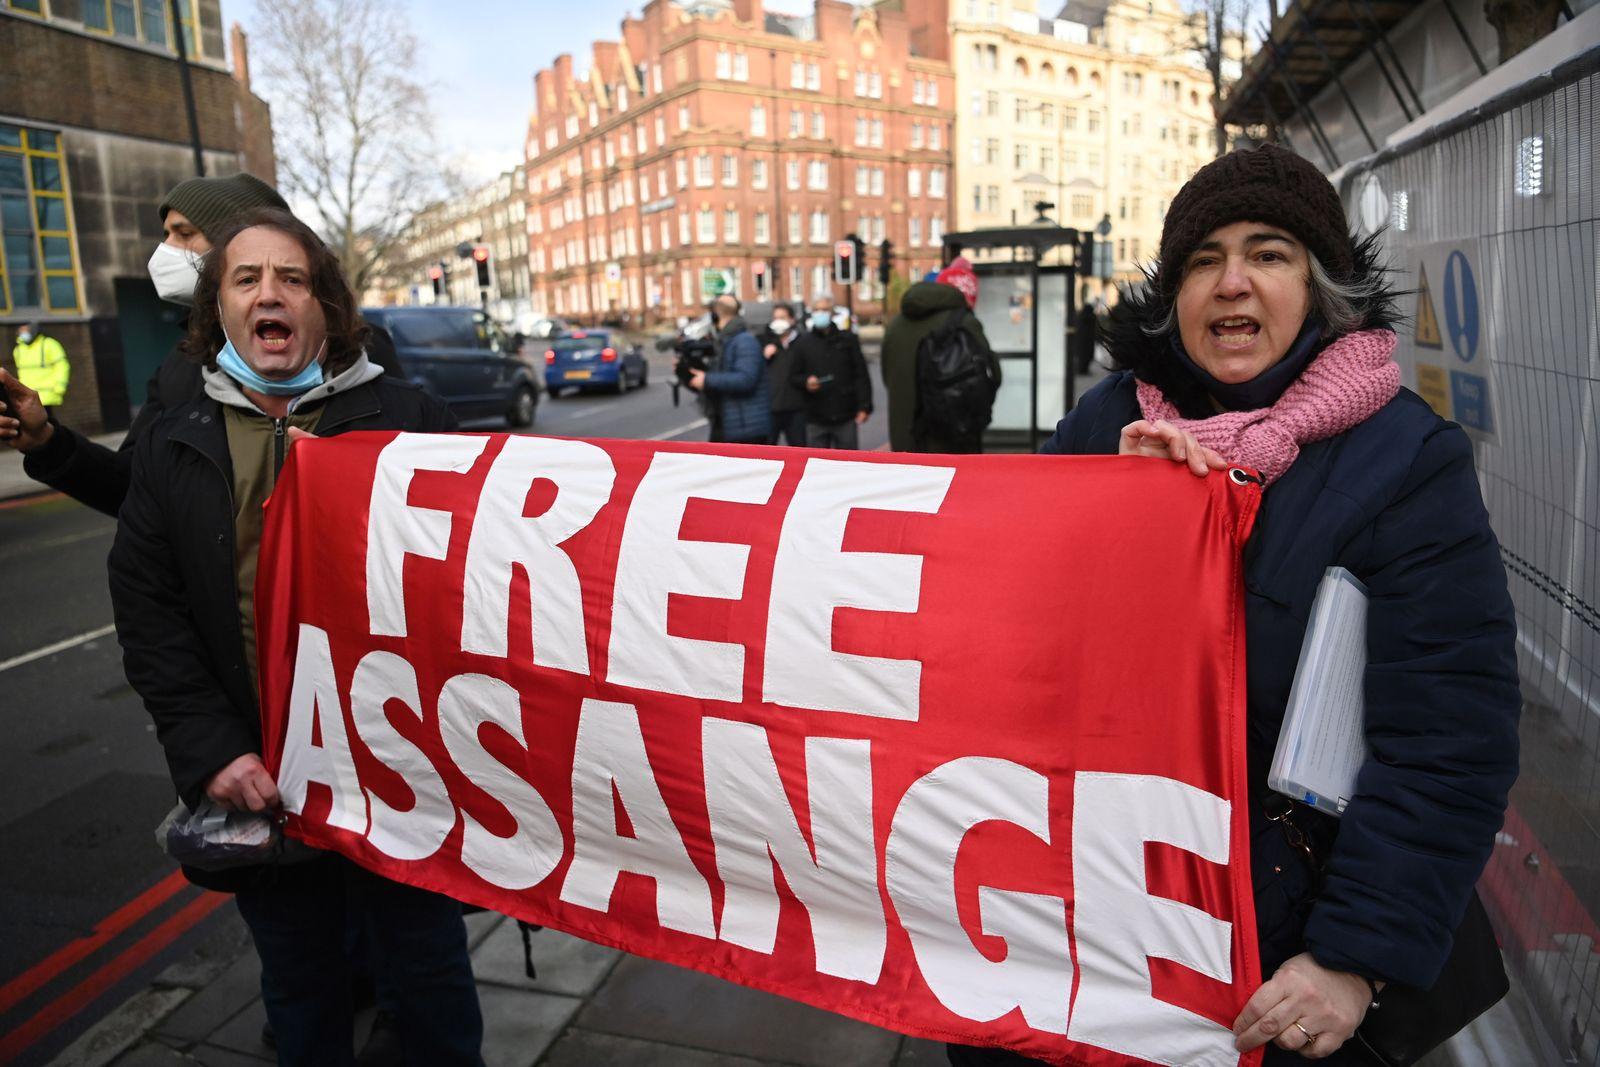 Julian Assange bail hearing, London, United Kingdom - 06 Jan 2021